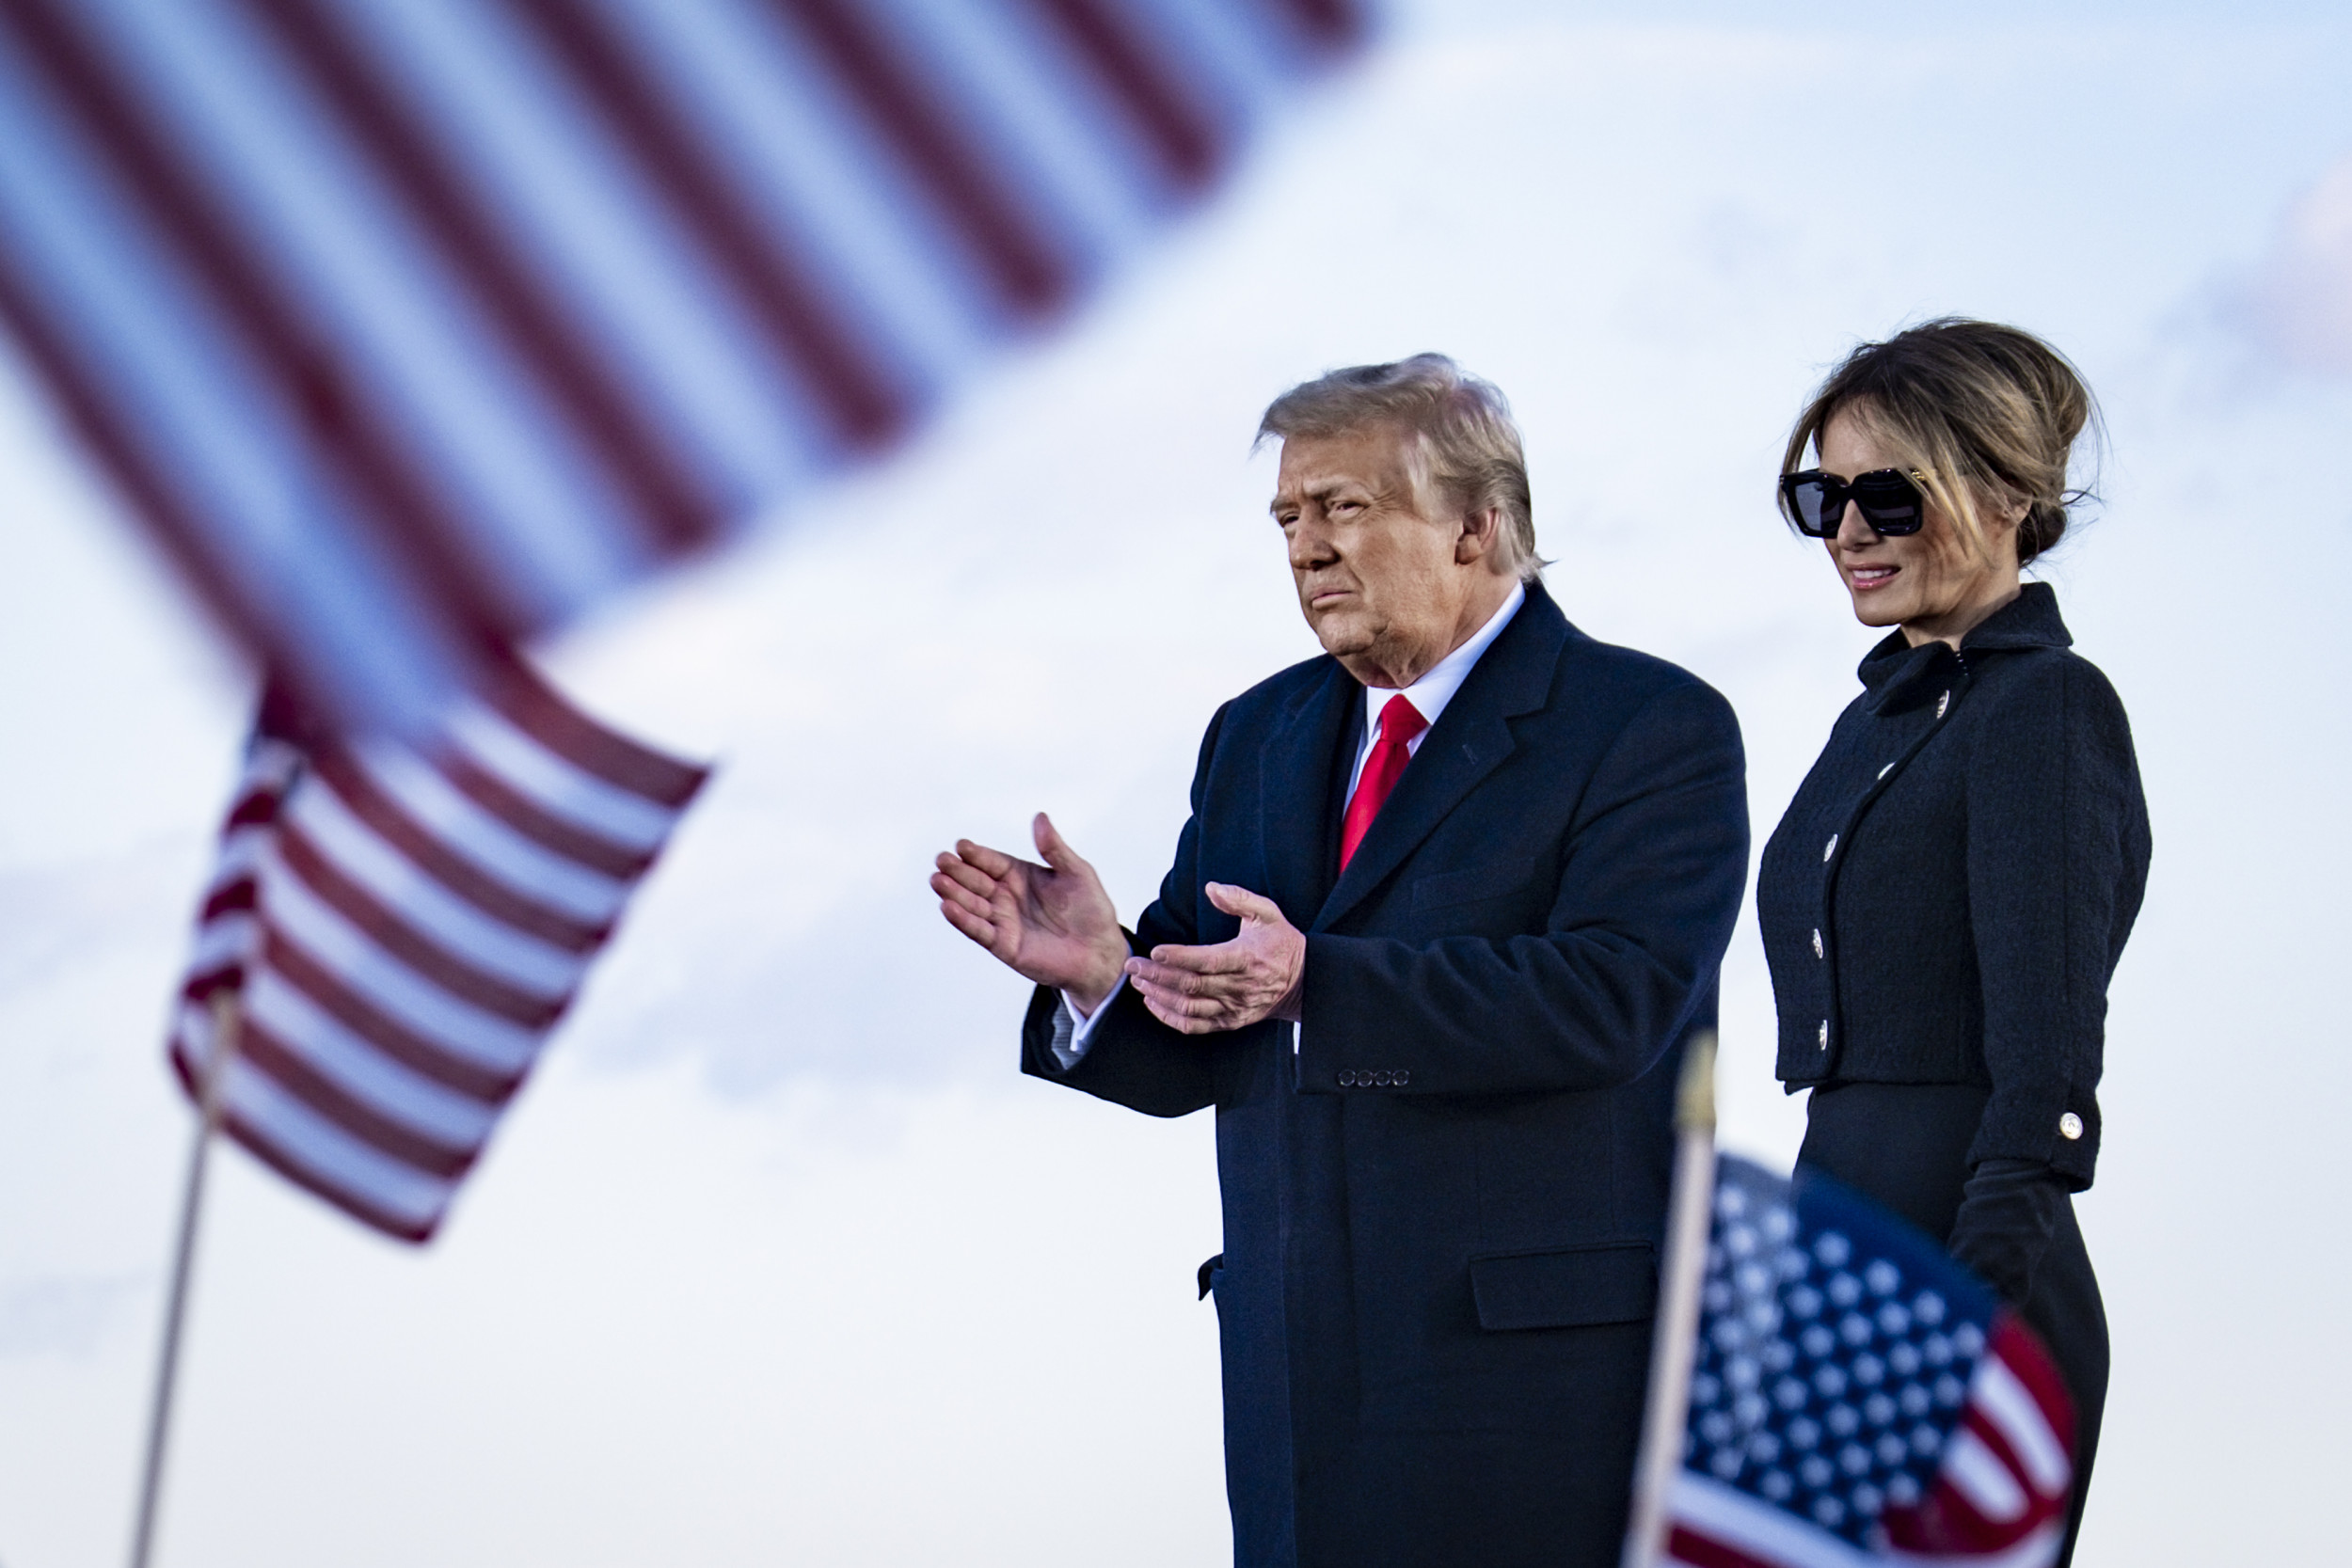 PATRIOT LION TEA Towel Patriot Party Republican Trump 1776